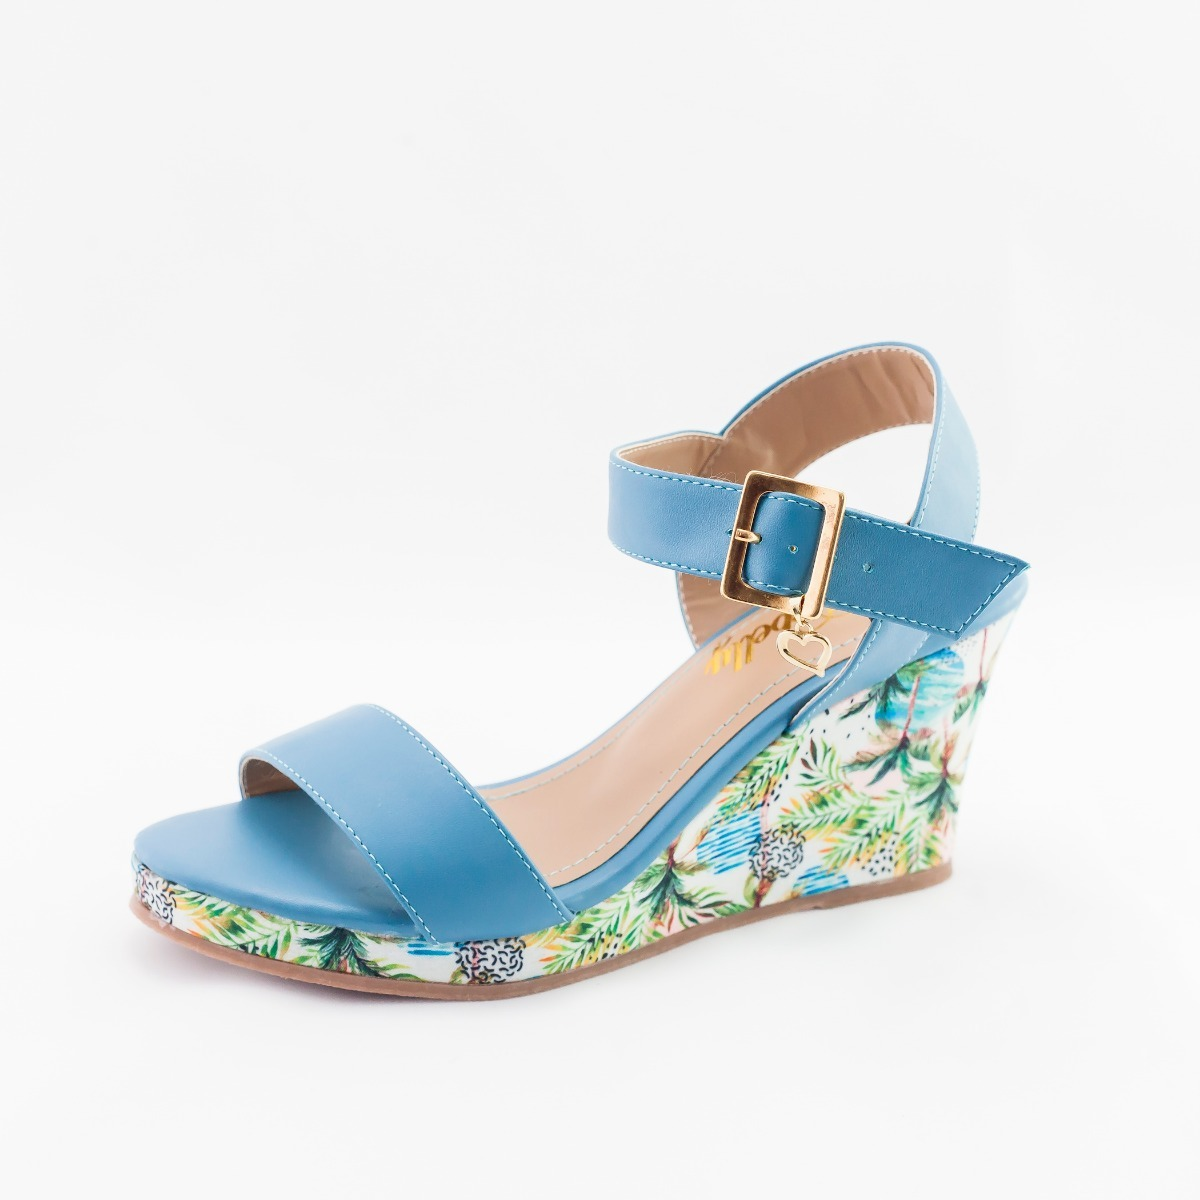 ddaa5c5fa0 sandália feminina anabela aberta floral salto médio cores. Carregando zoom.